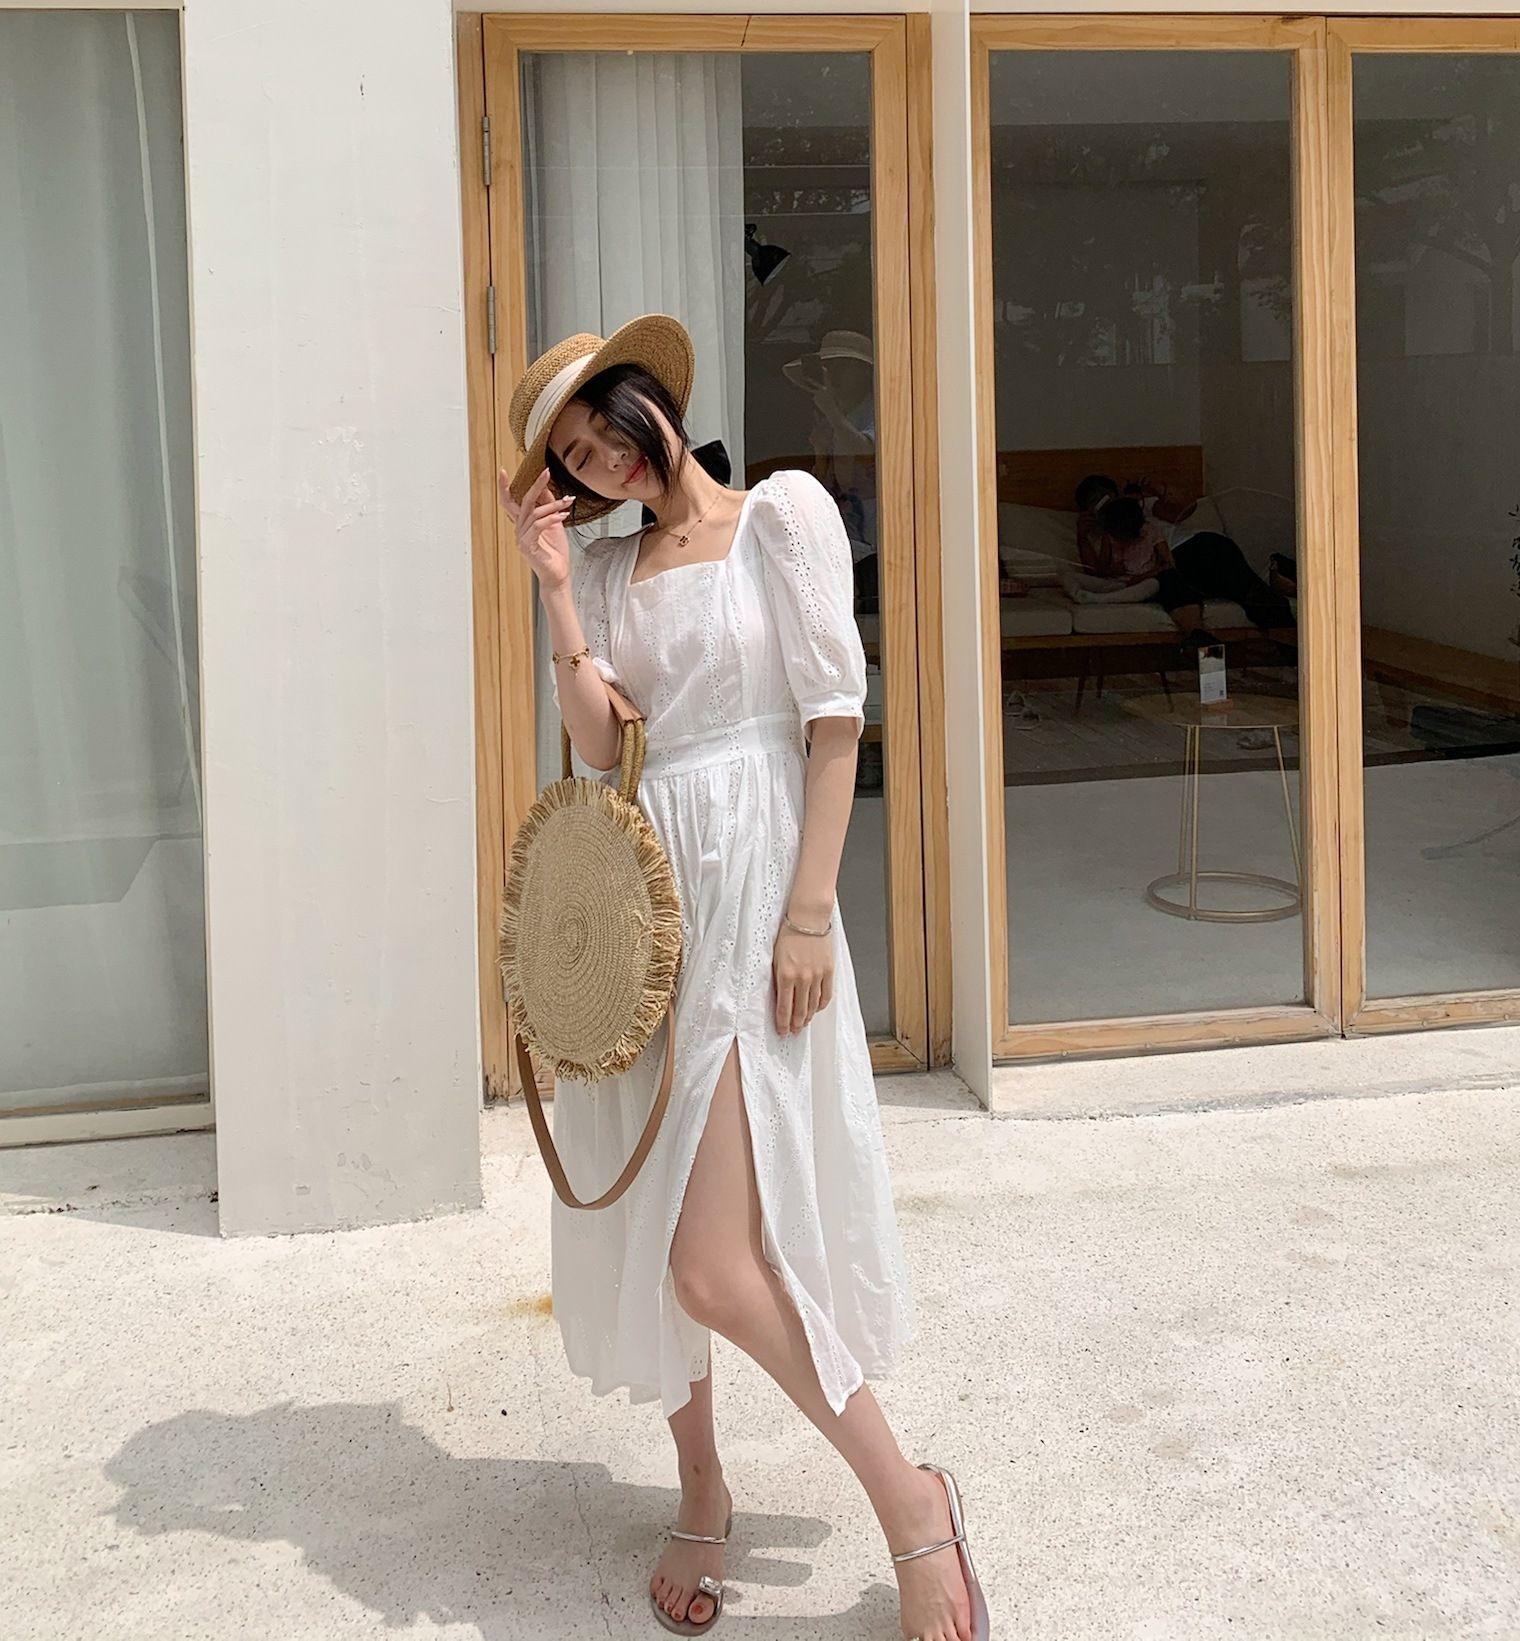 jFieJ Square collar bubble grandiflorum white split hollow light mature style fairy French Platycodon sleeve temperament dress dress summer w